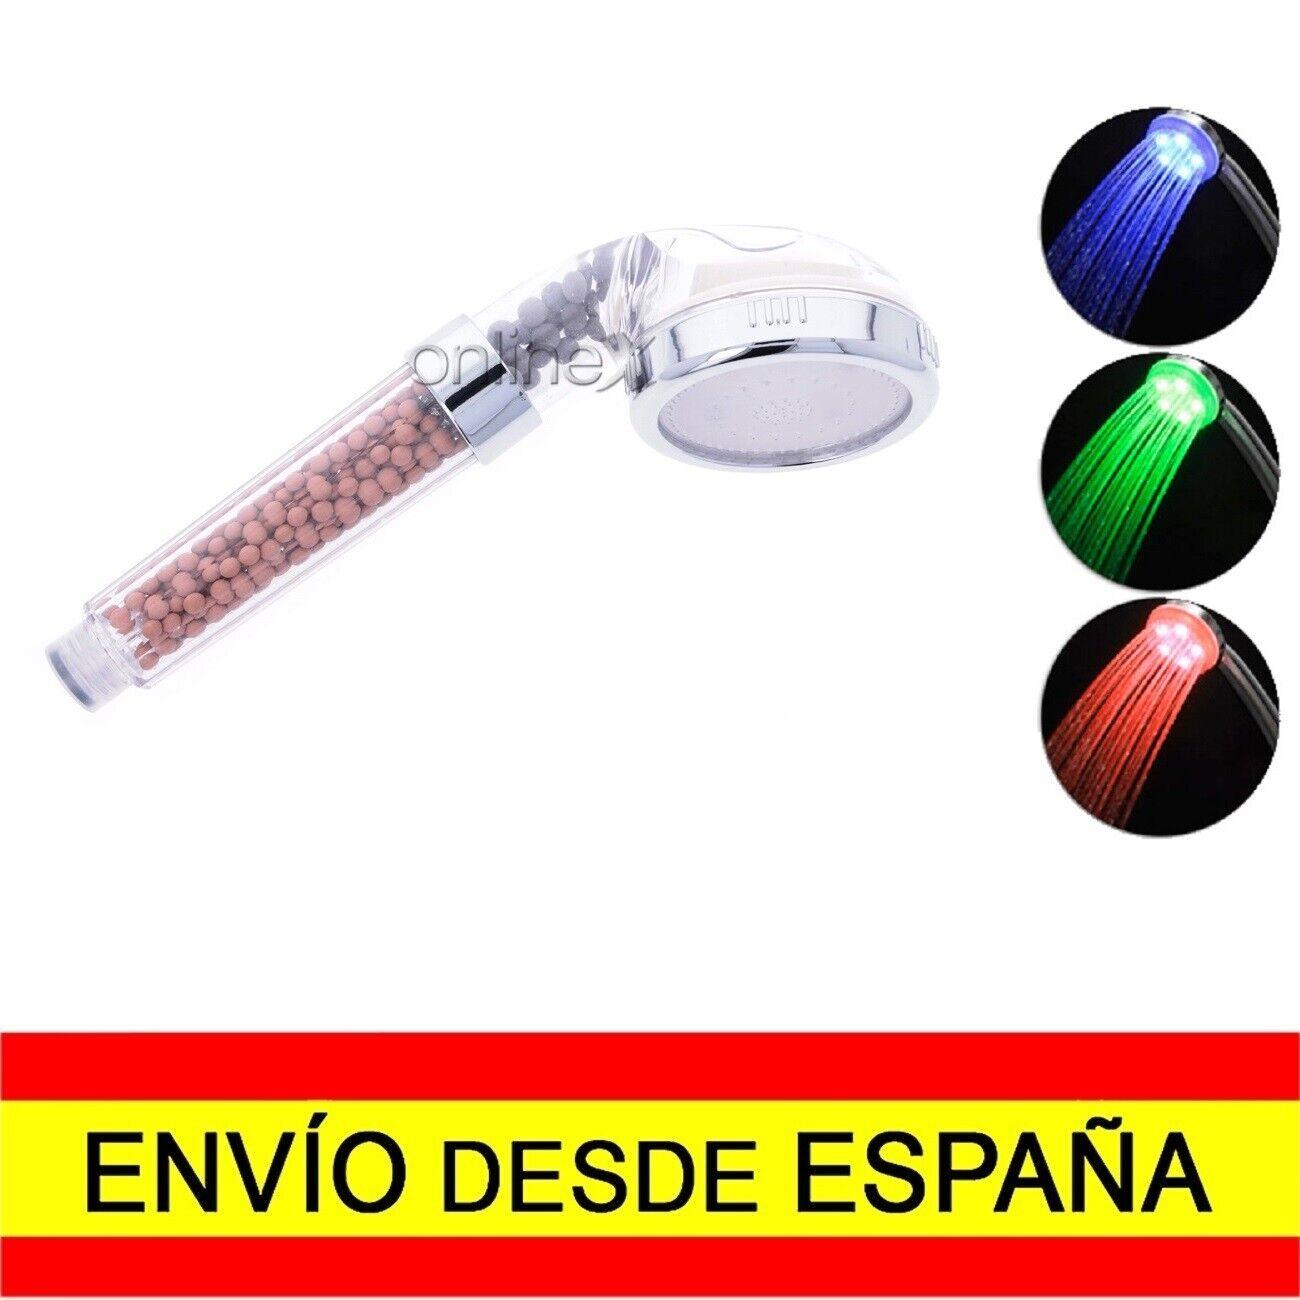 Alcachofa Grifo Ducha Masaje Purificación Luz LED 6 Colores EnvÍo 48/72H. a2139